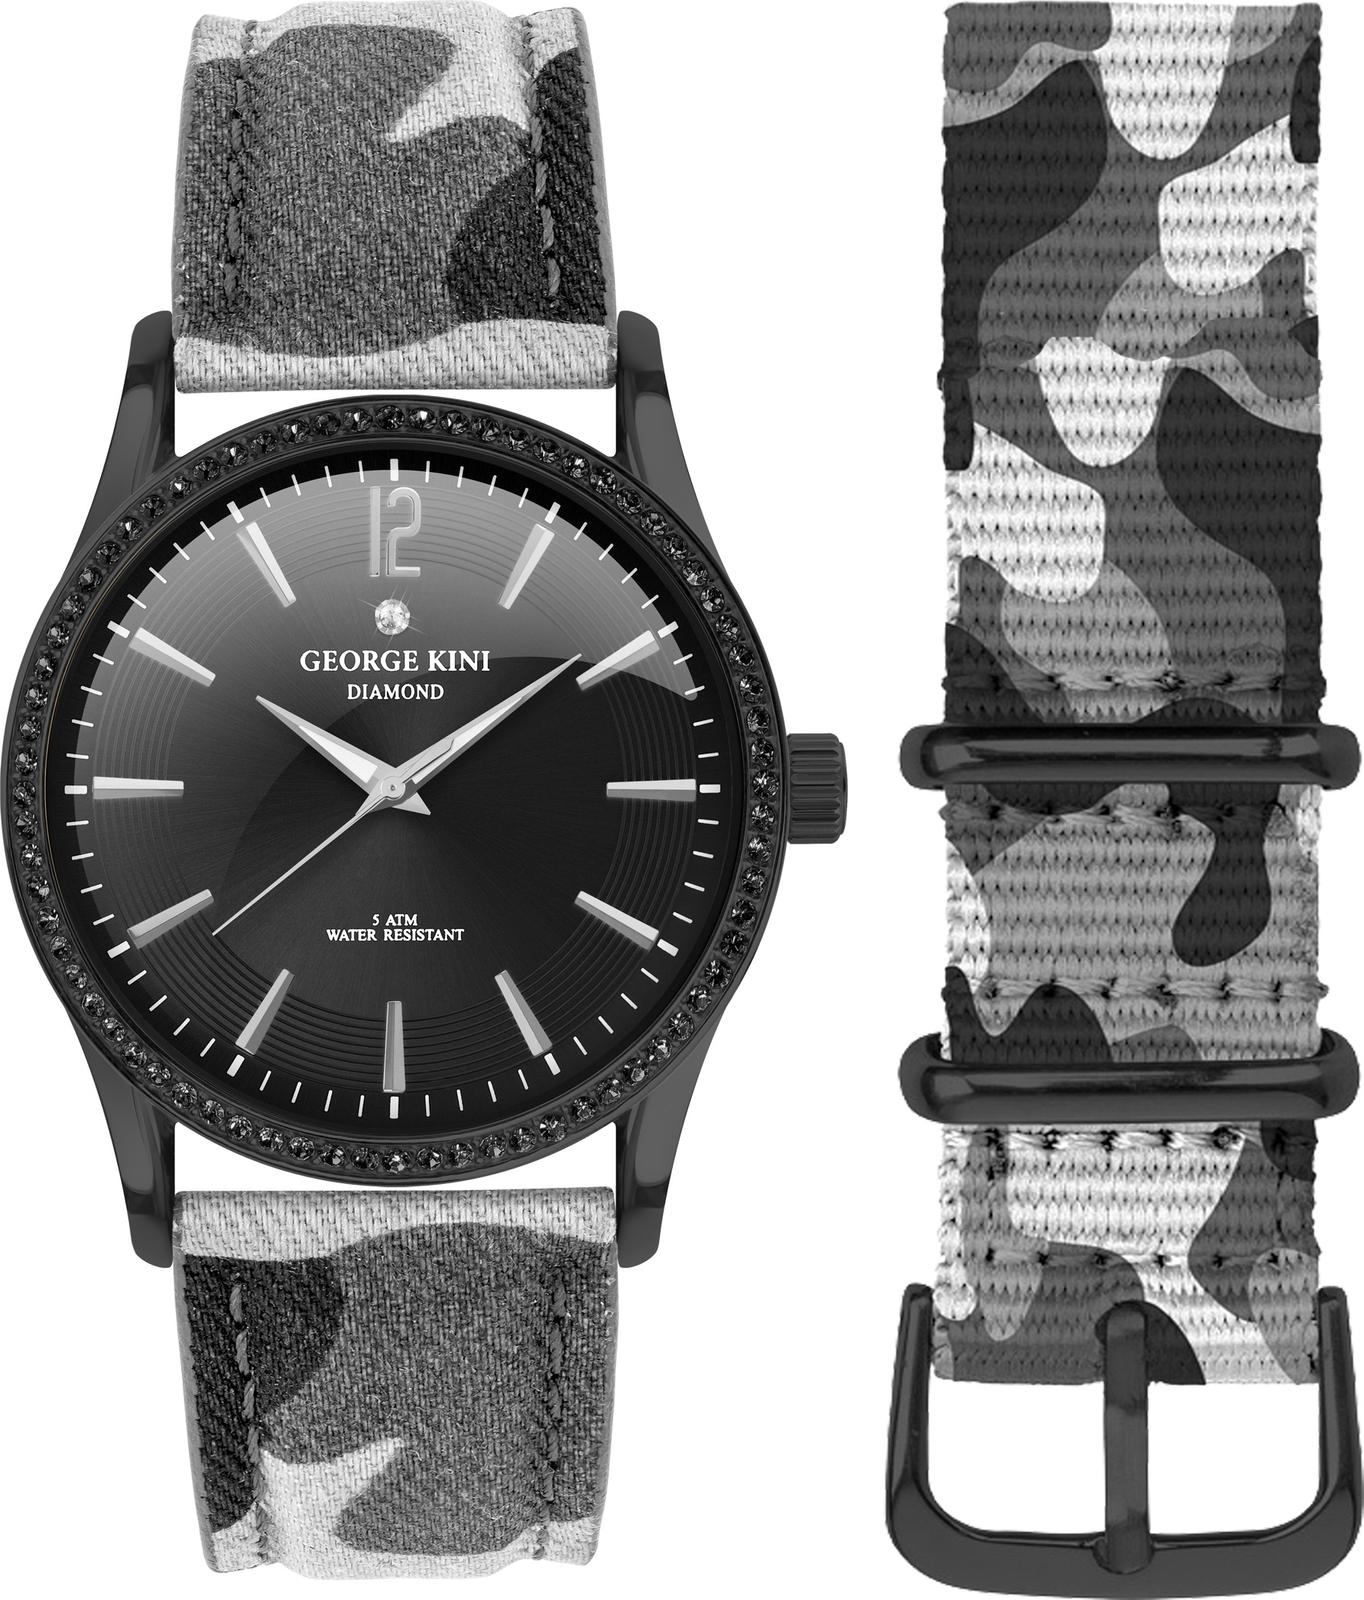 Наручные часы George Kini женские черный